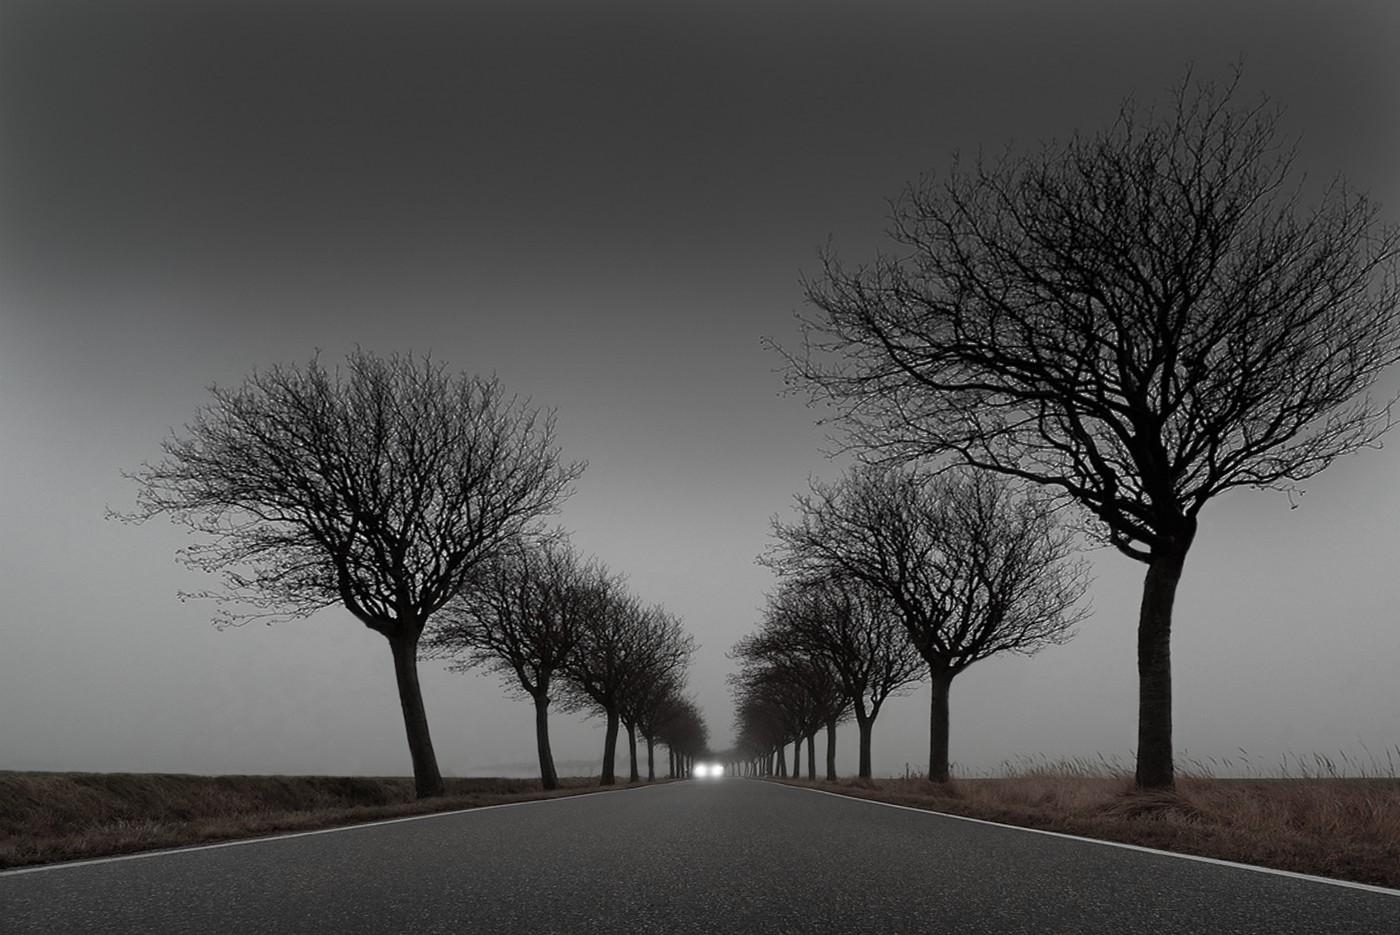 Road ahaid